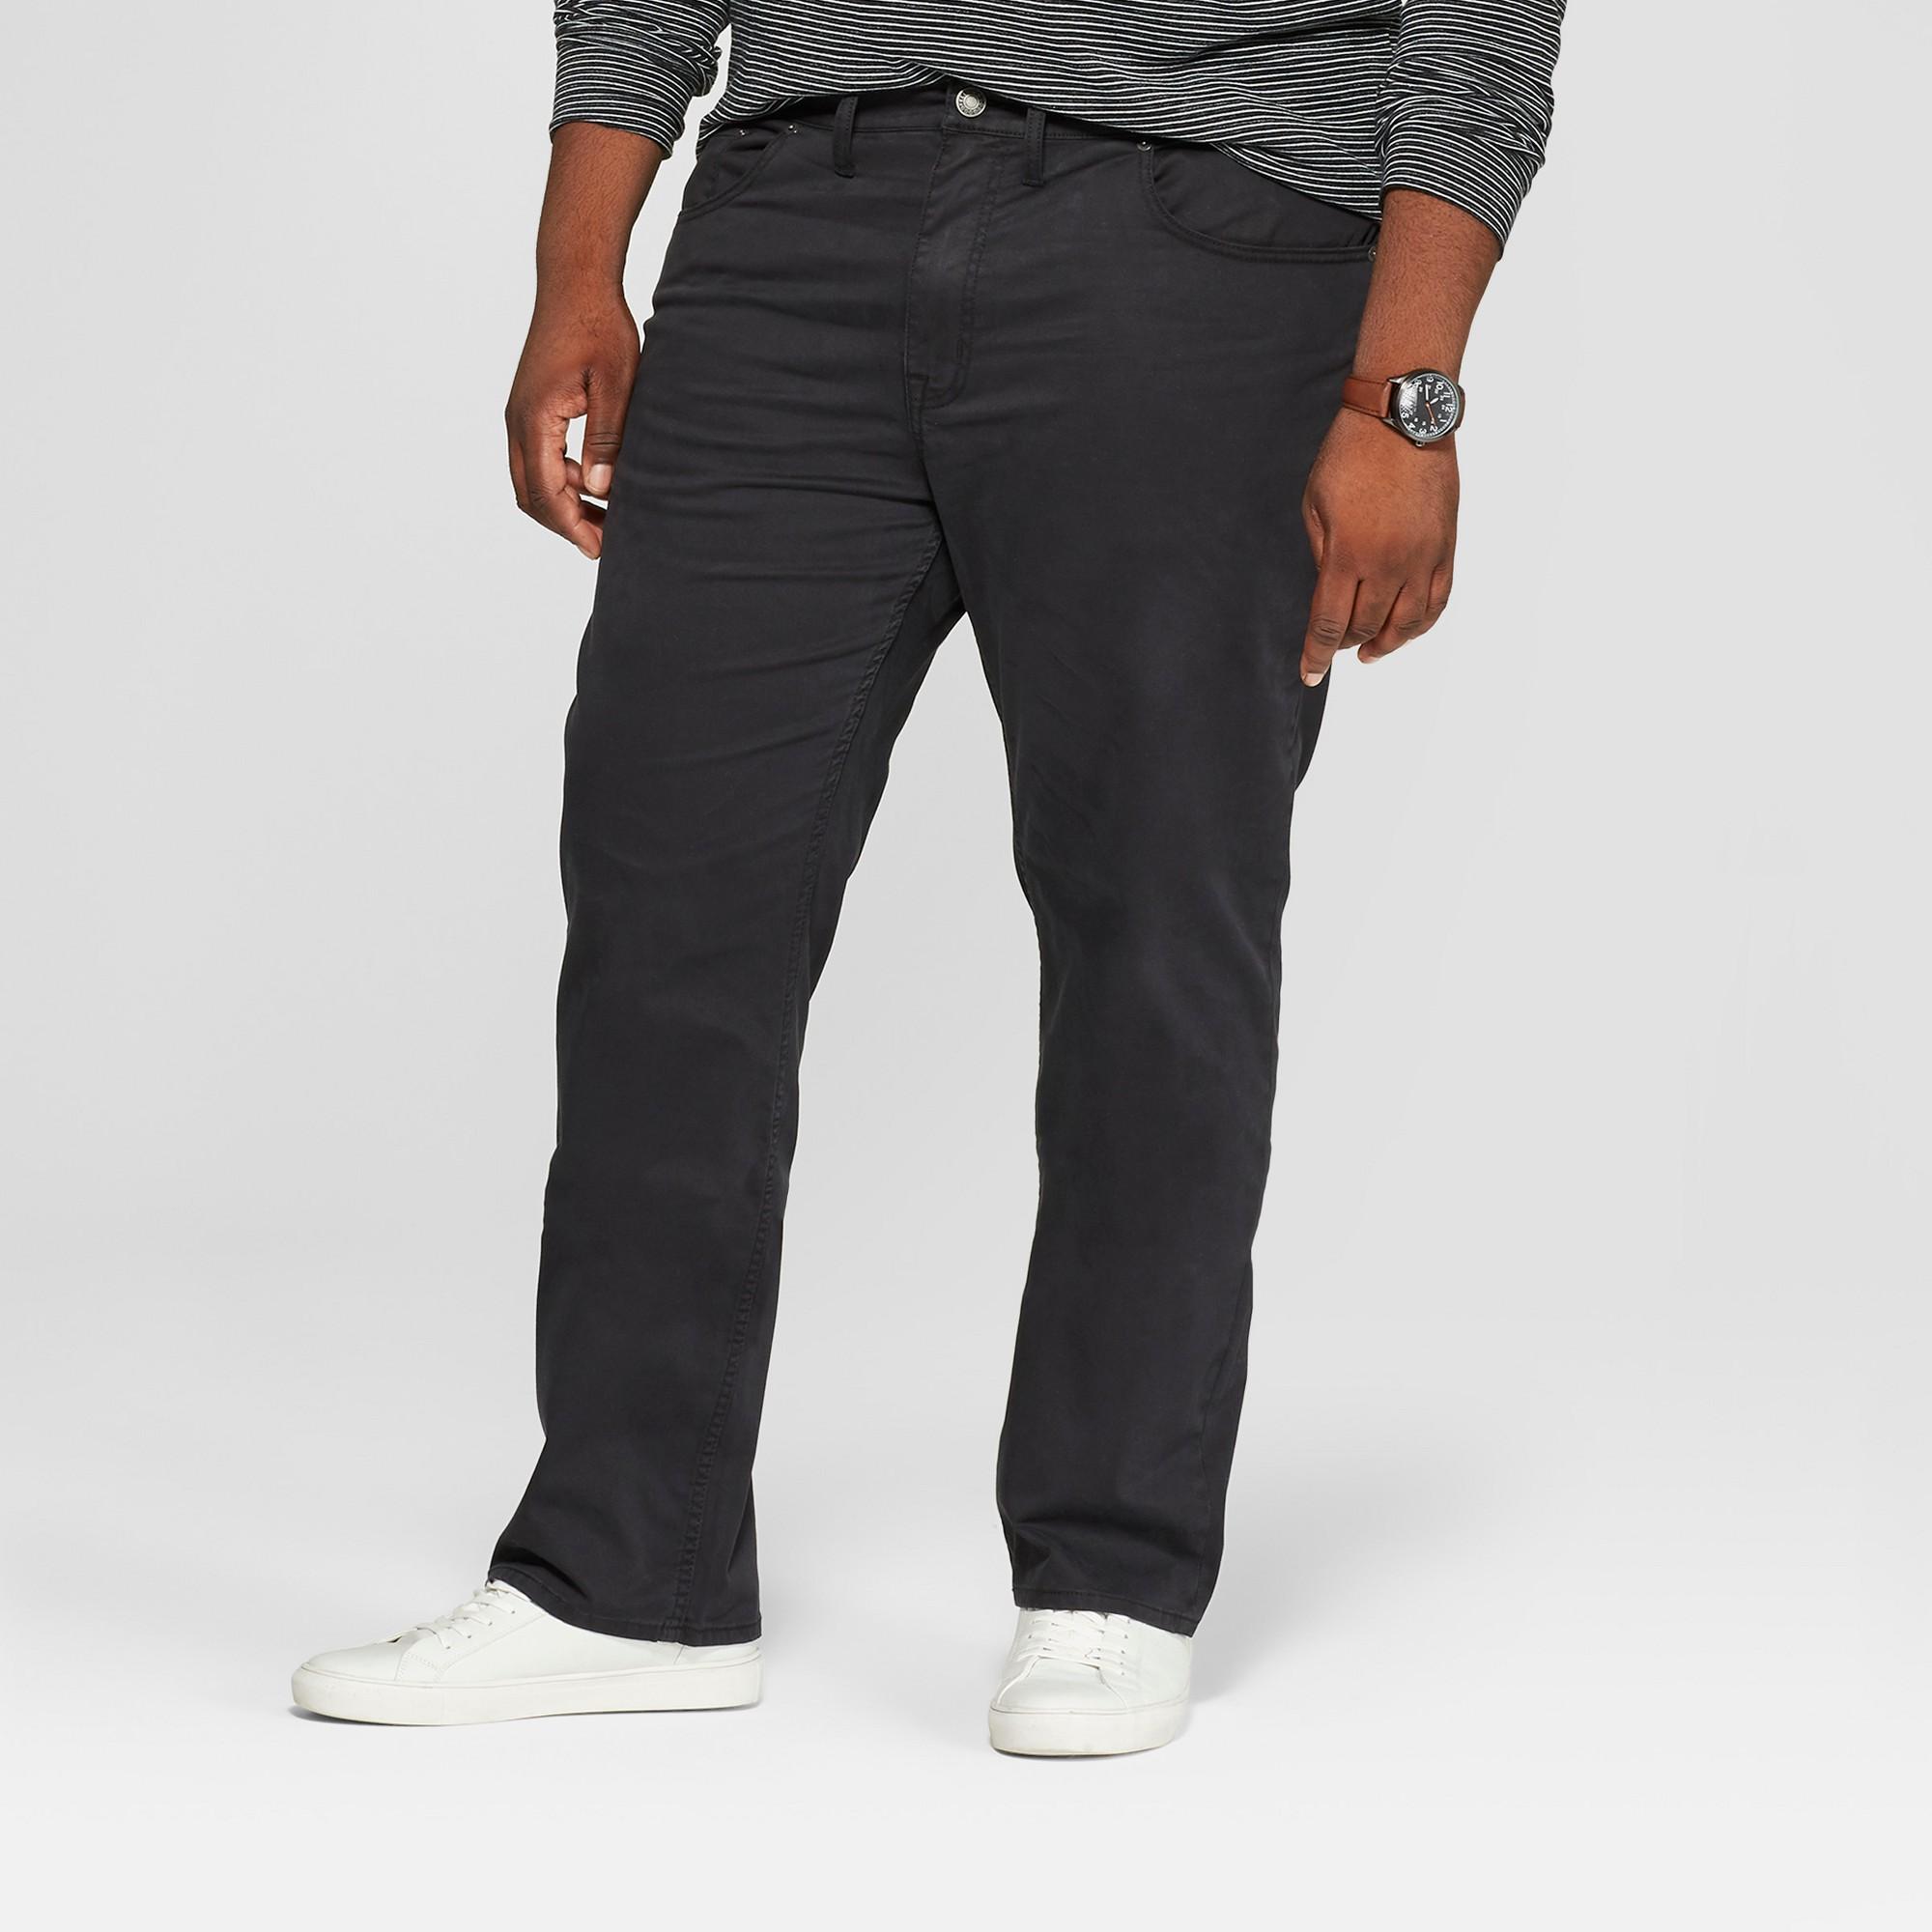 Men's Tall Regular Straight Fit Chino Pants - Goodfellow & Co Black 32x36